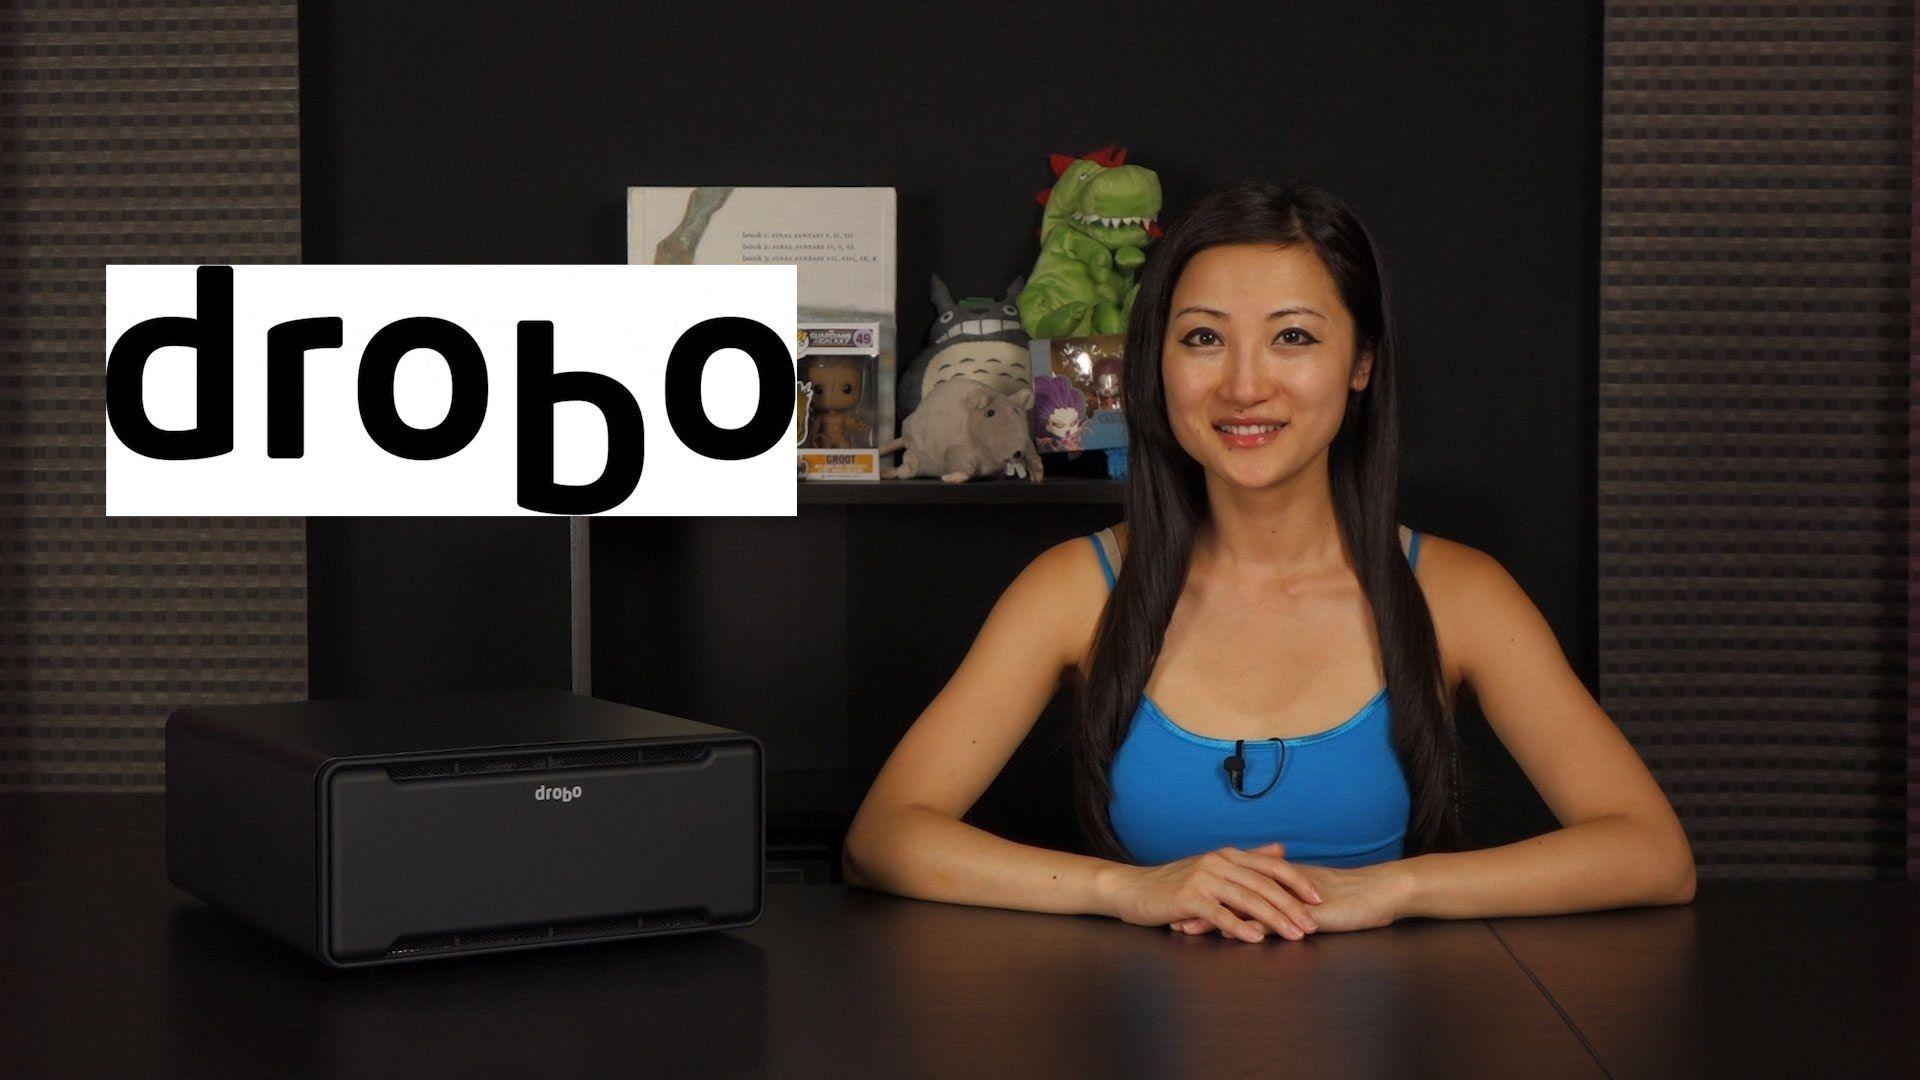 Drobo B810n NAS: Overview + Software Tutorial